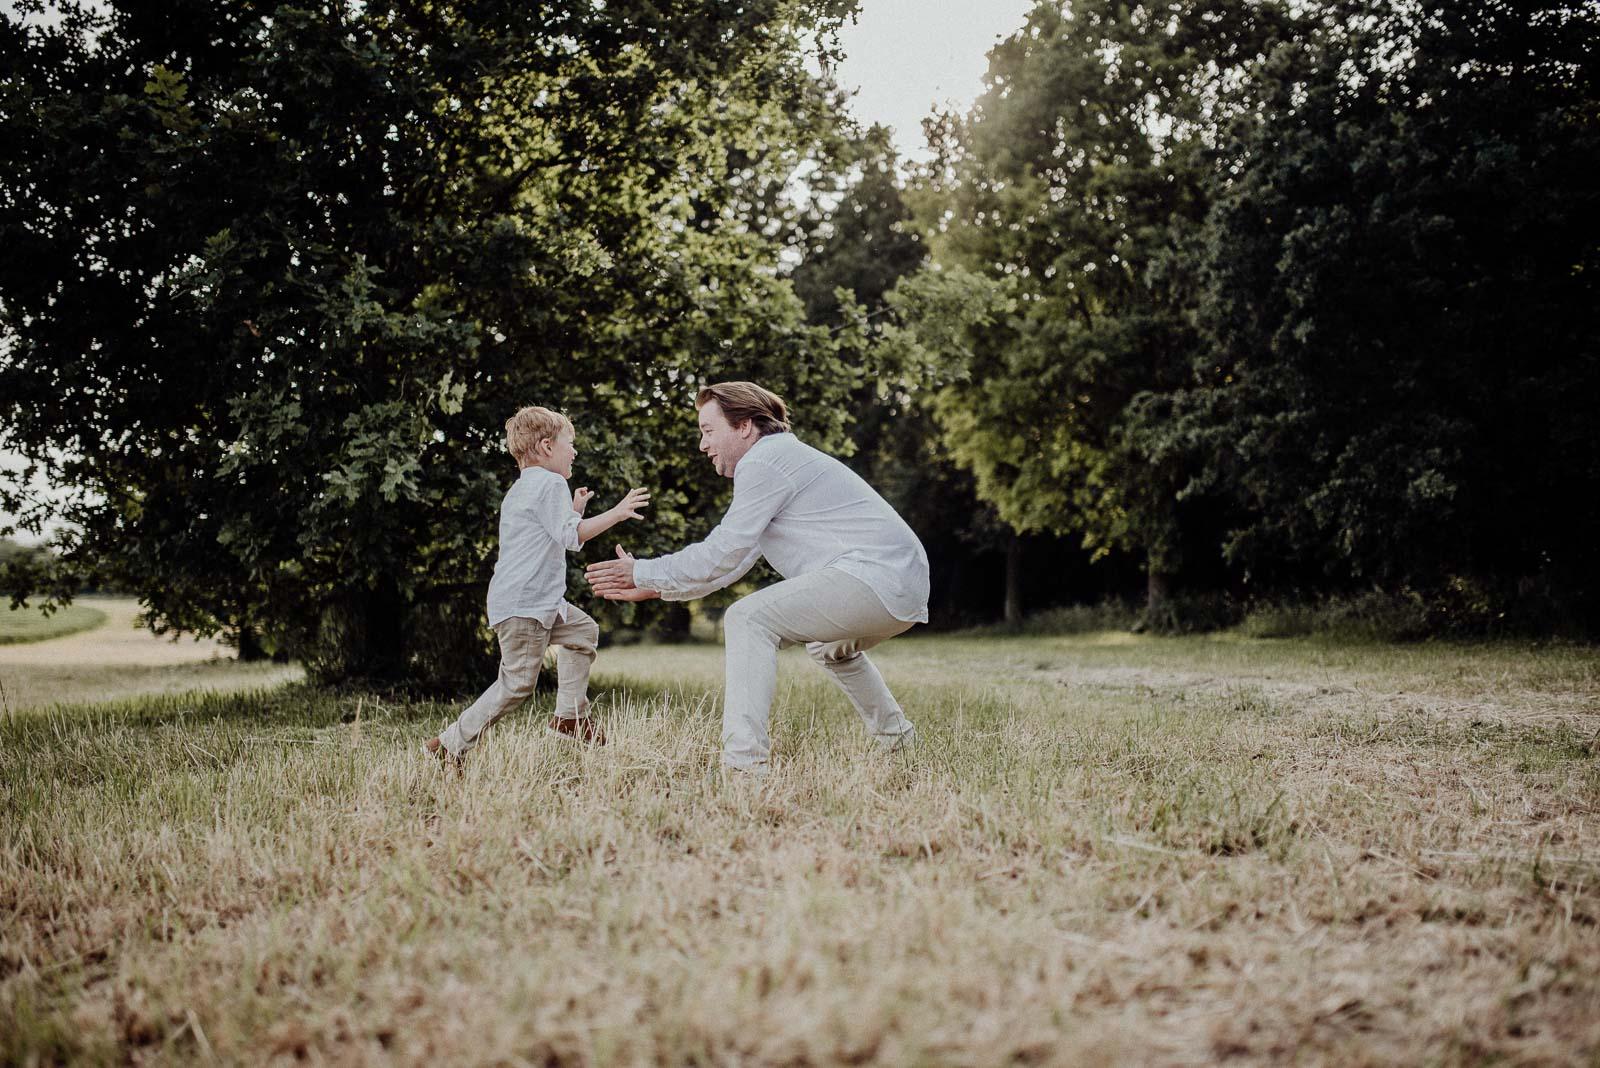 026-familien-fotoshooting-herne-heide